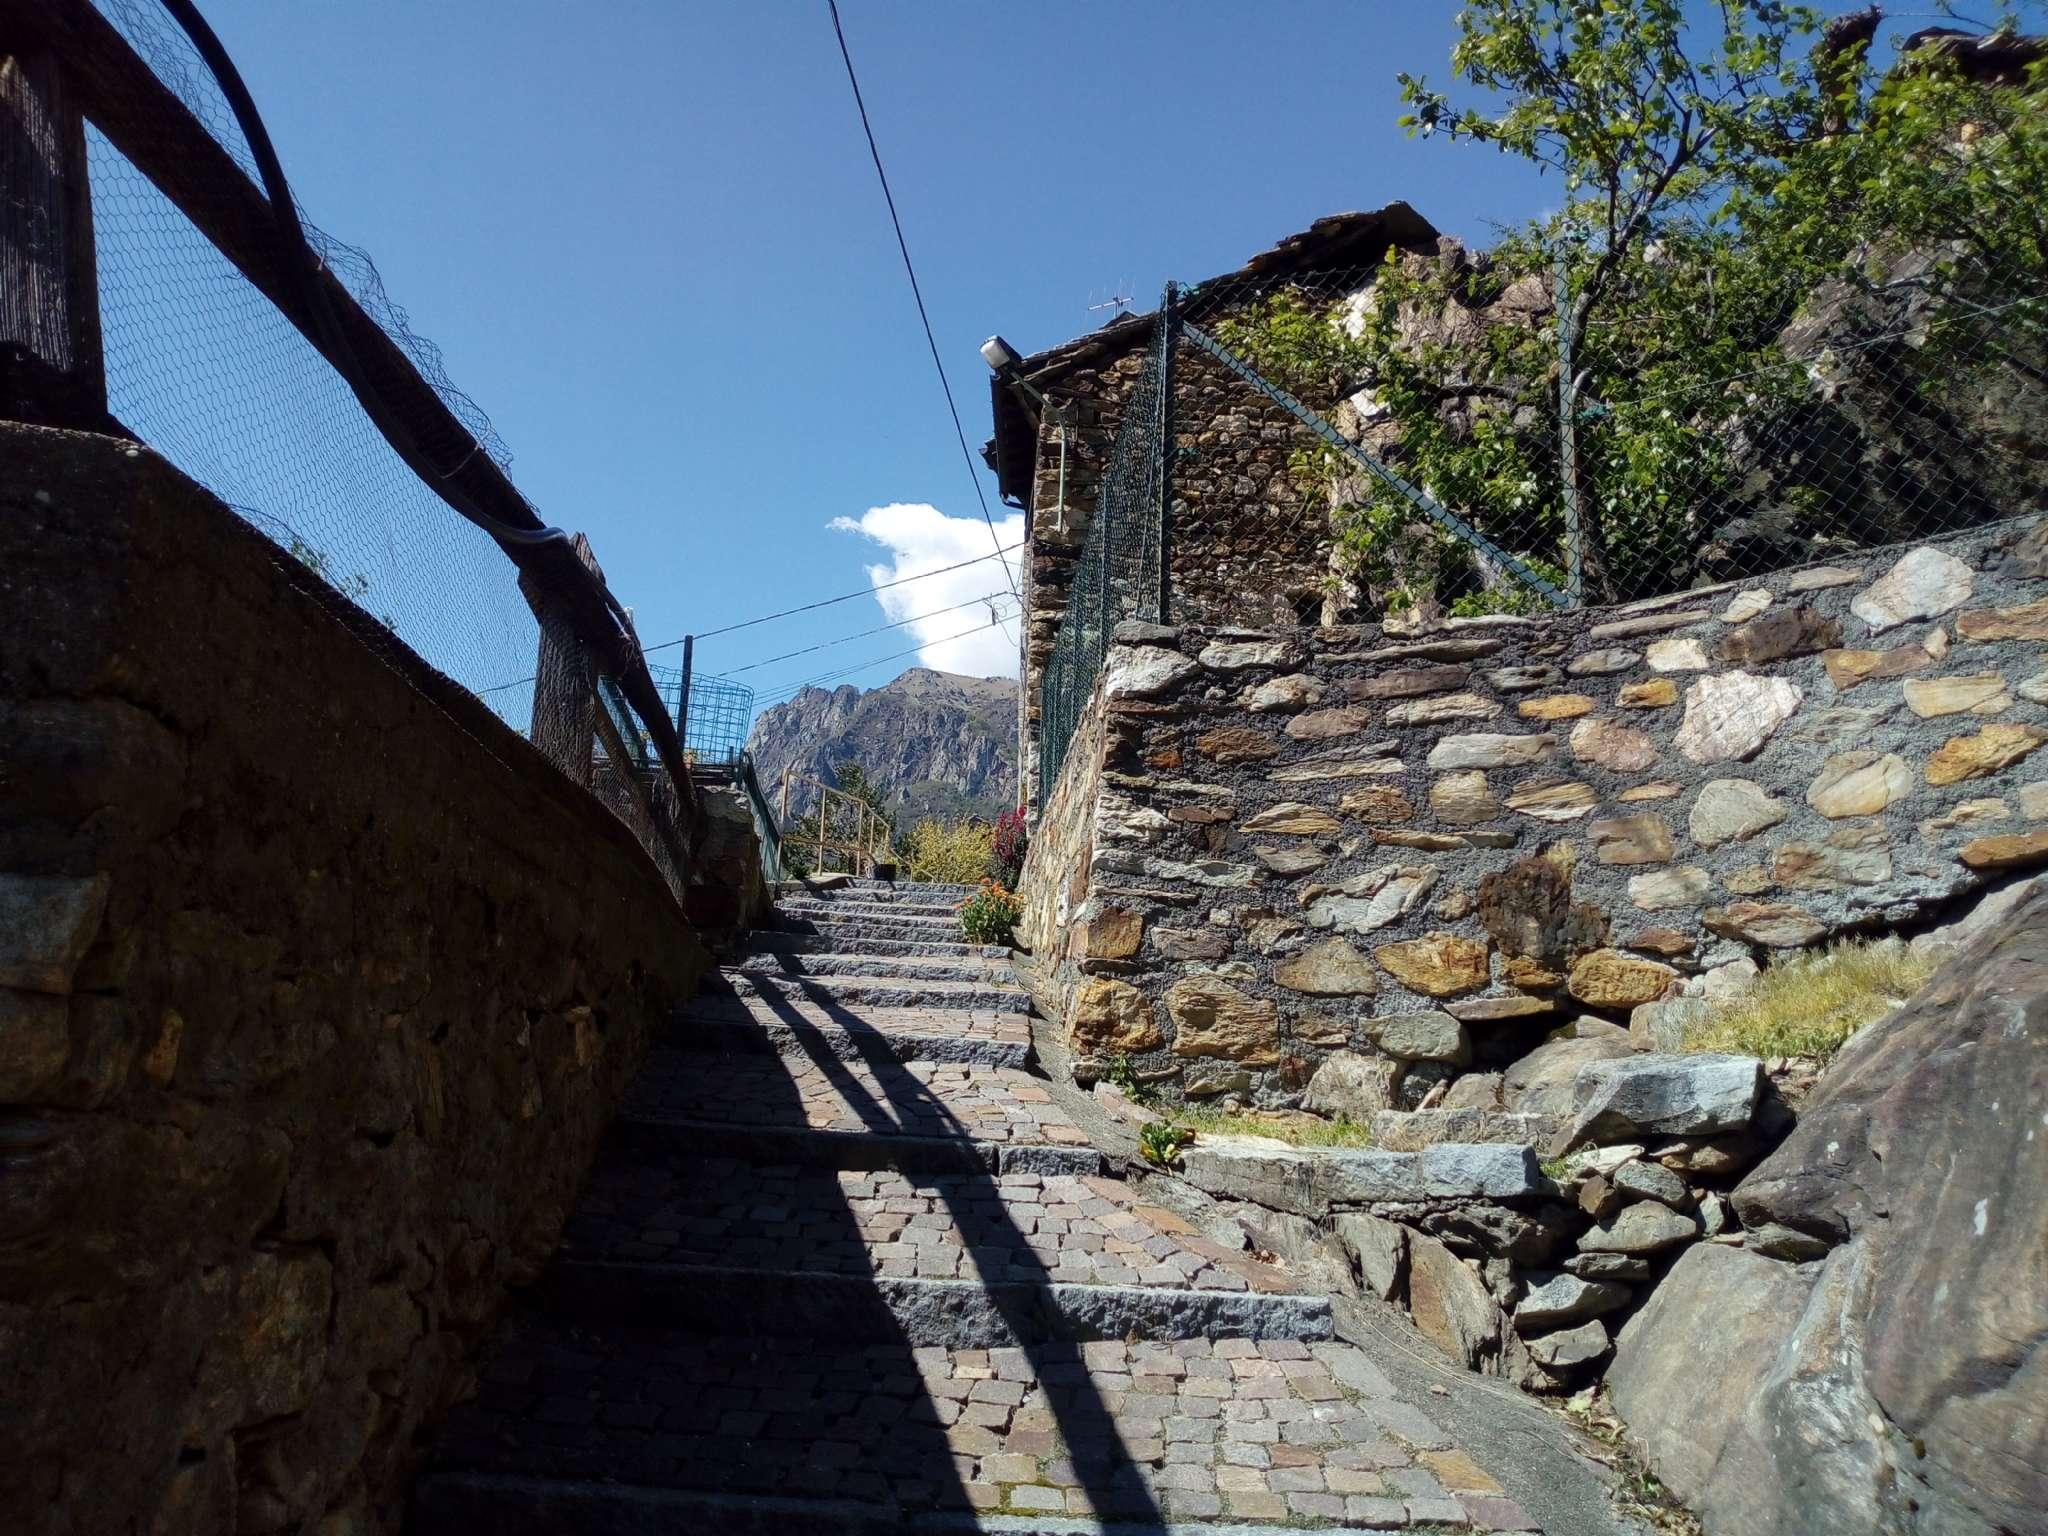 Foto 1 di Casa indipendente frazione Ivery, Pont Saint Martin